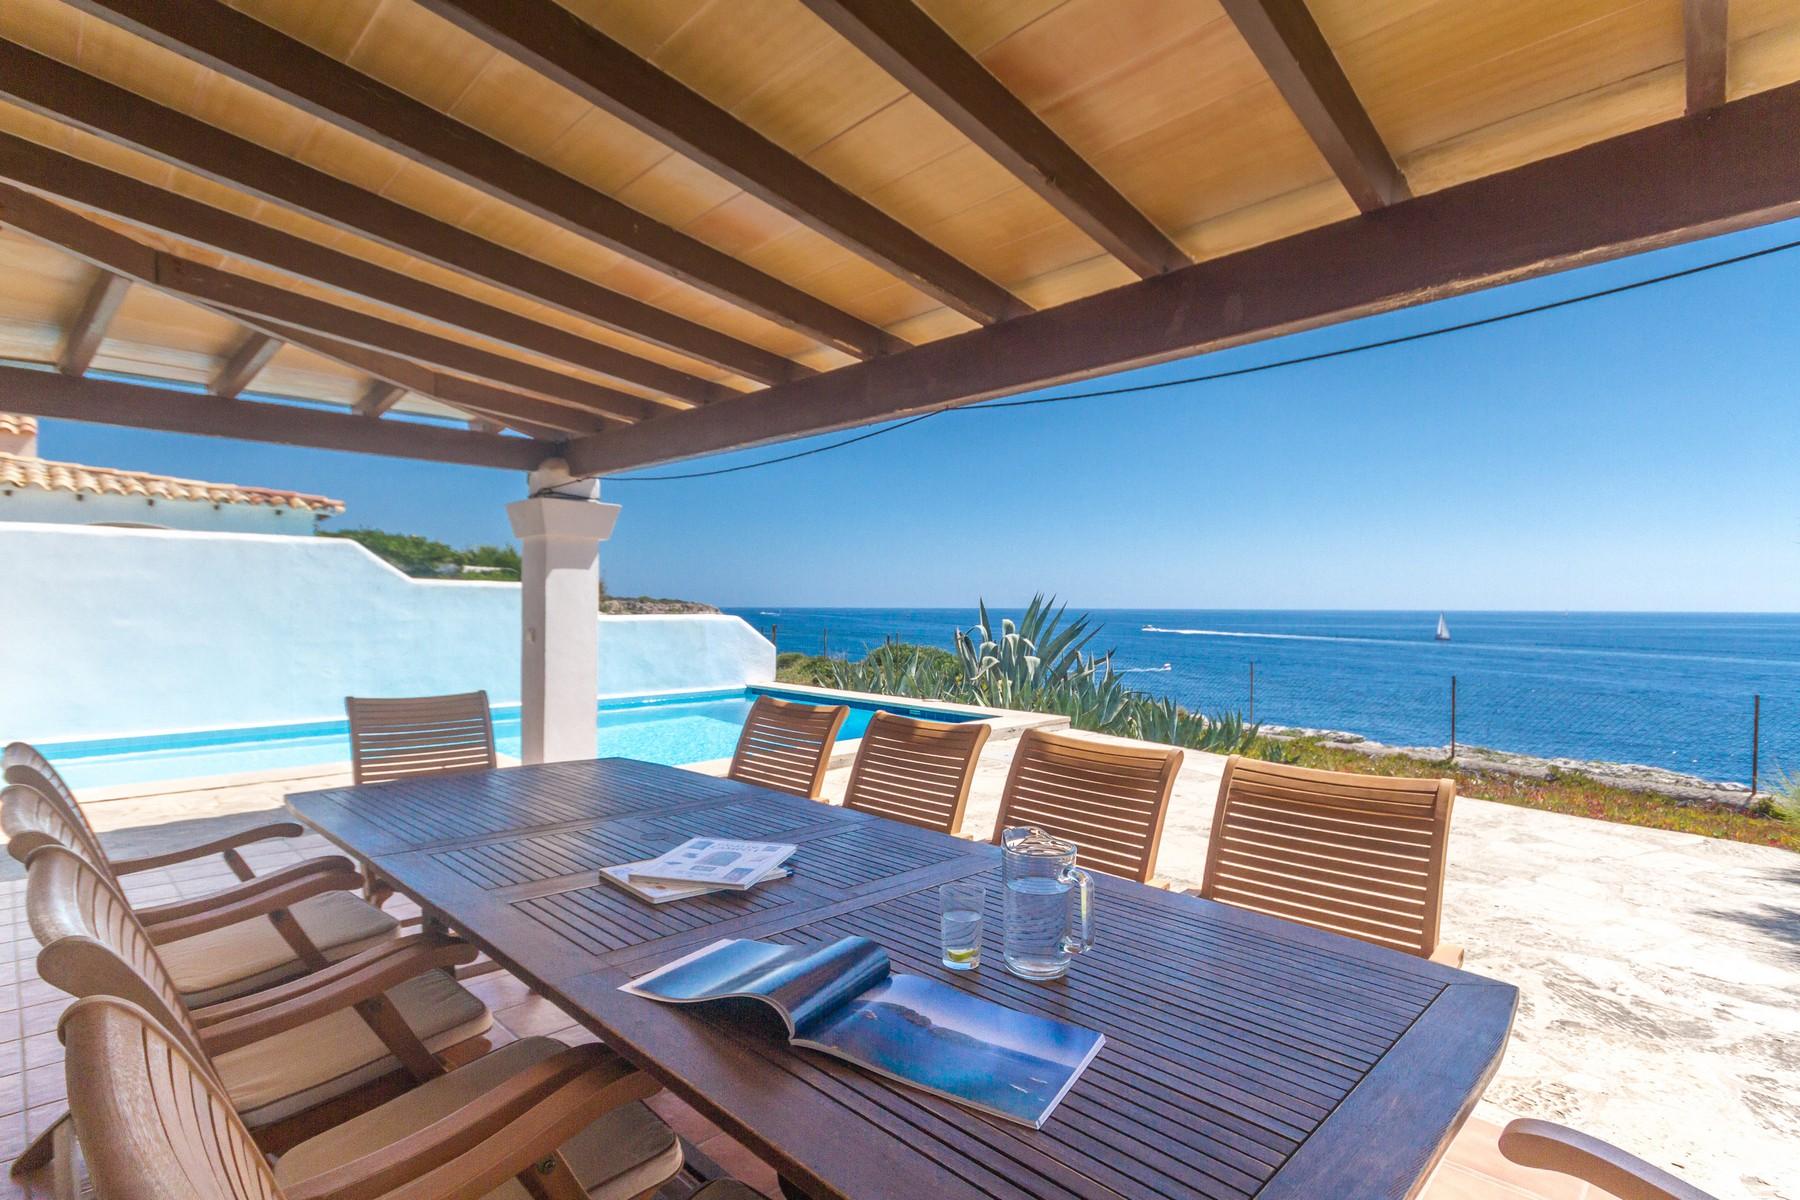 Частный односемейный дом для того Аренда на Impressive villa with panoramic views in Soller Other Balearic Islands, Balearic Islands 07100 Испания